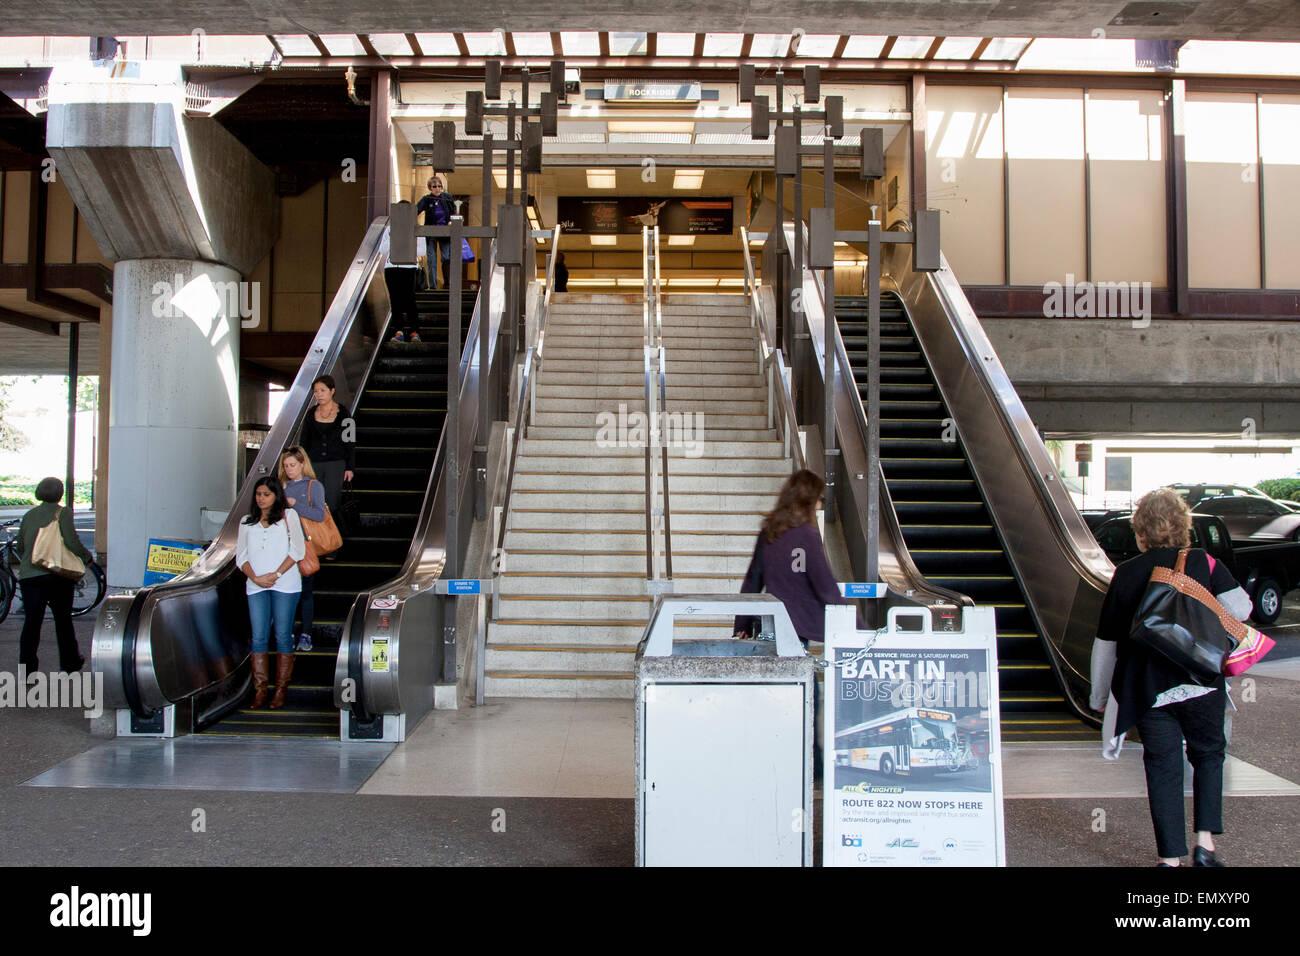 Entrance to the Rockridge BART station in Oakland, California. - Stock Image